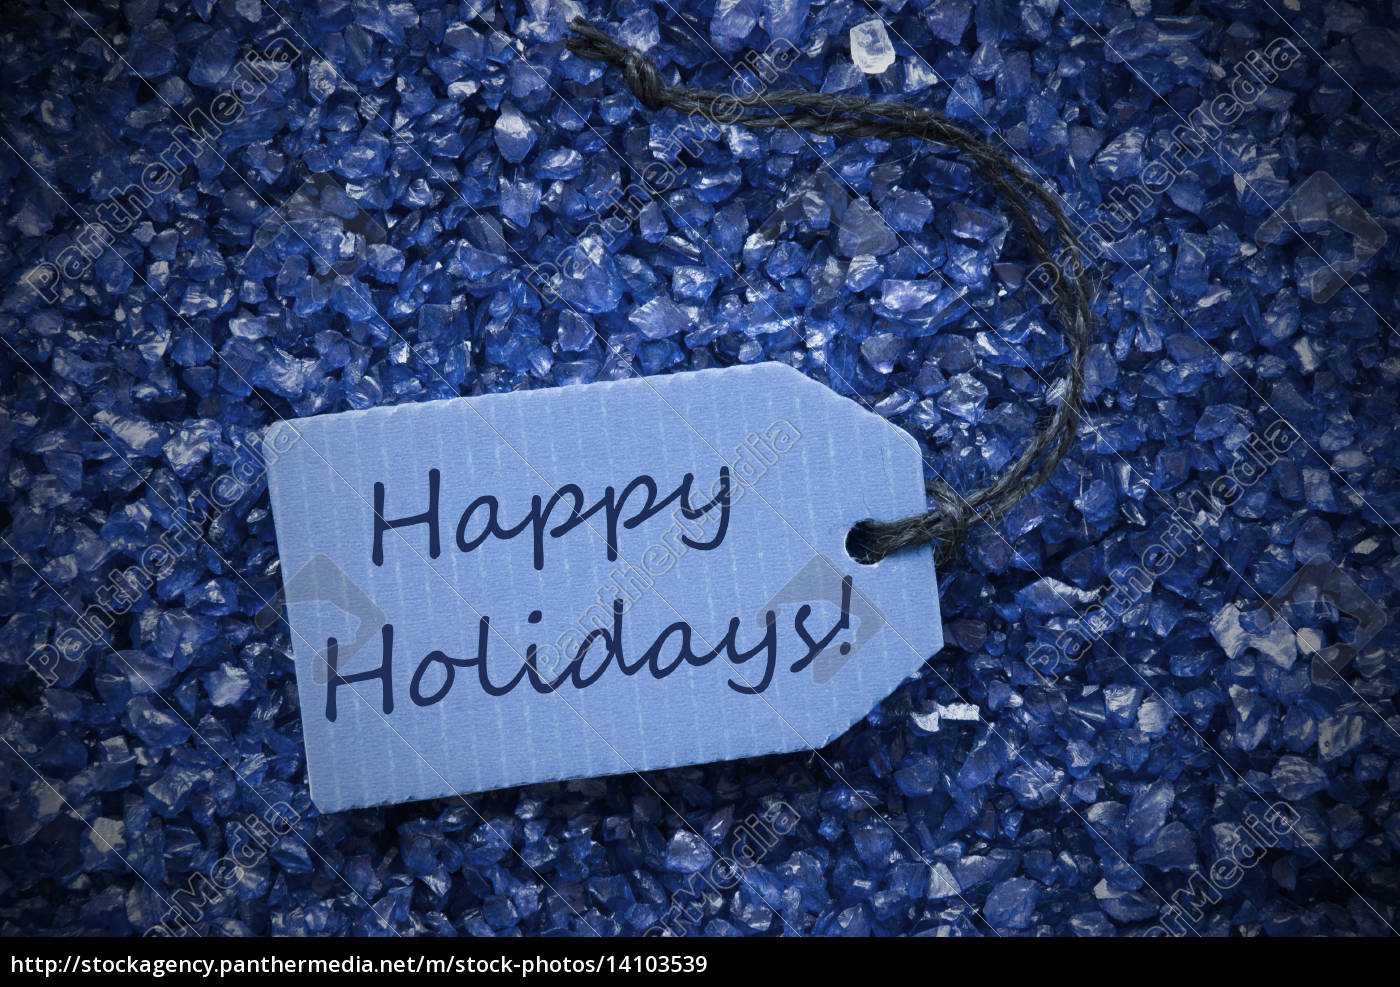 purple, stones, with, label, happy, holidays - 14103539